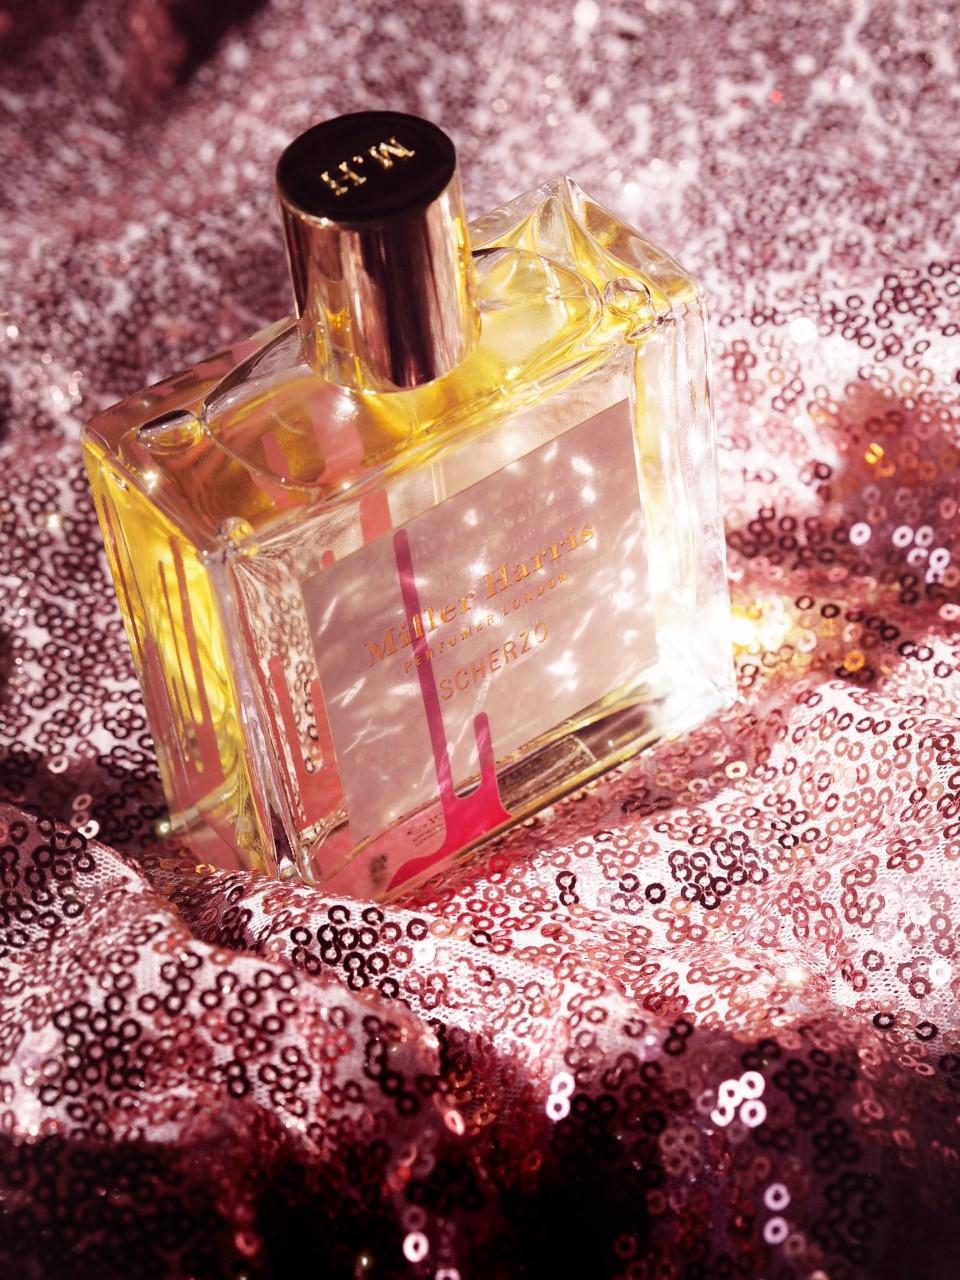 Miller Harris 'Scherzo' Review & The Best Seller Miller Harris Perfumes review 2021